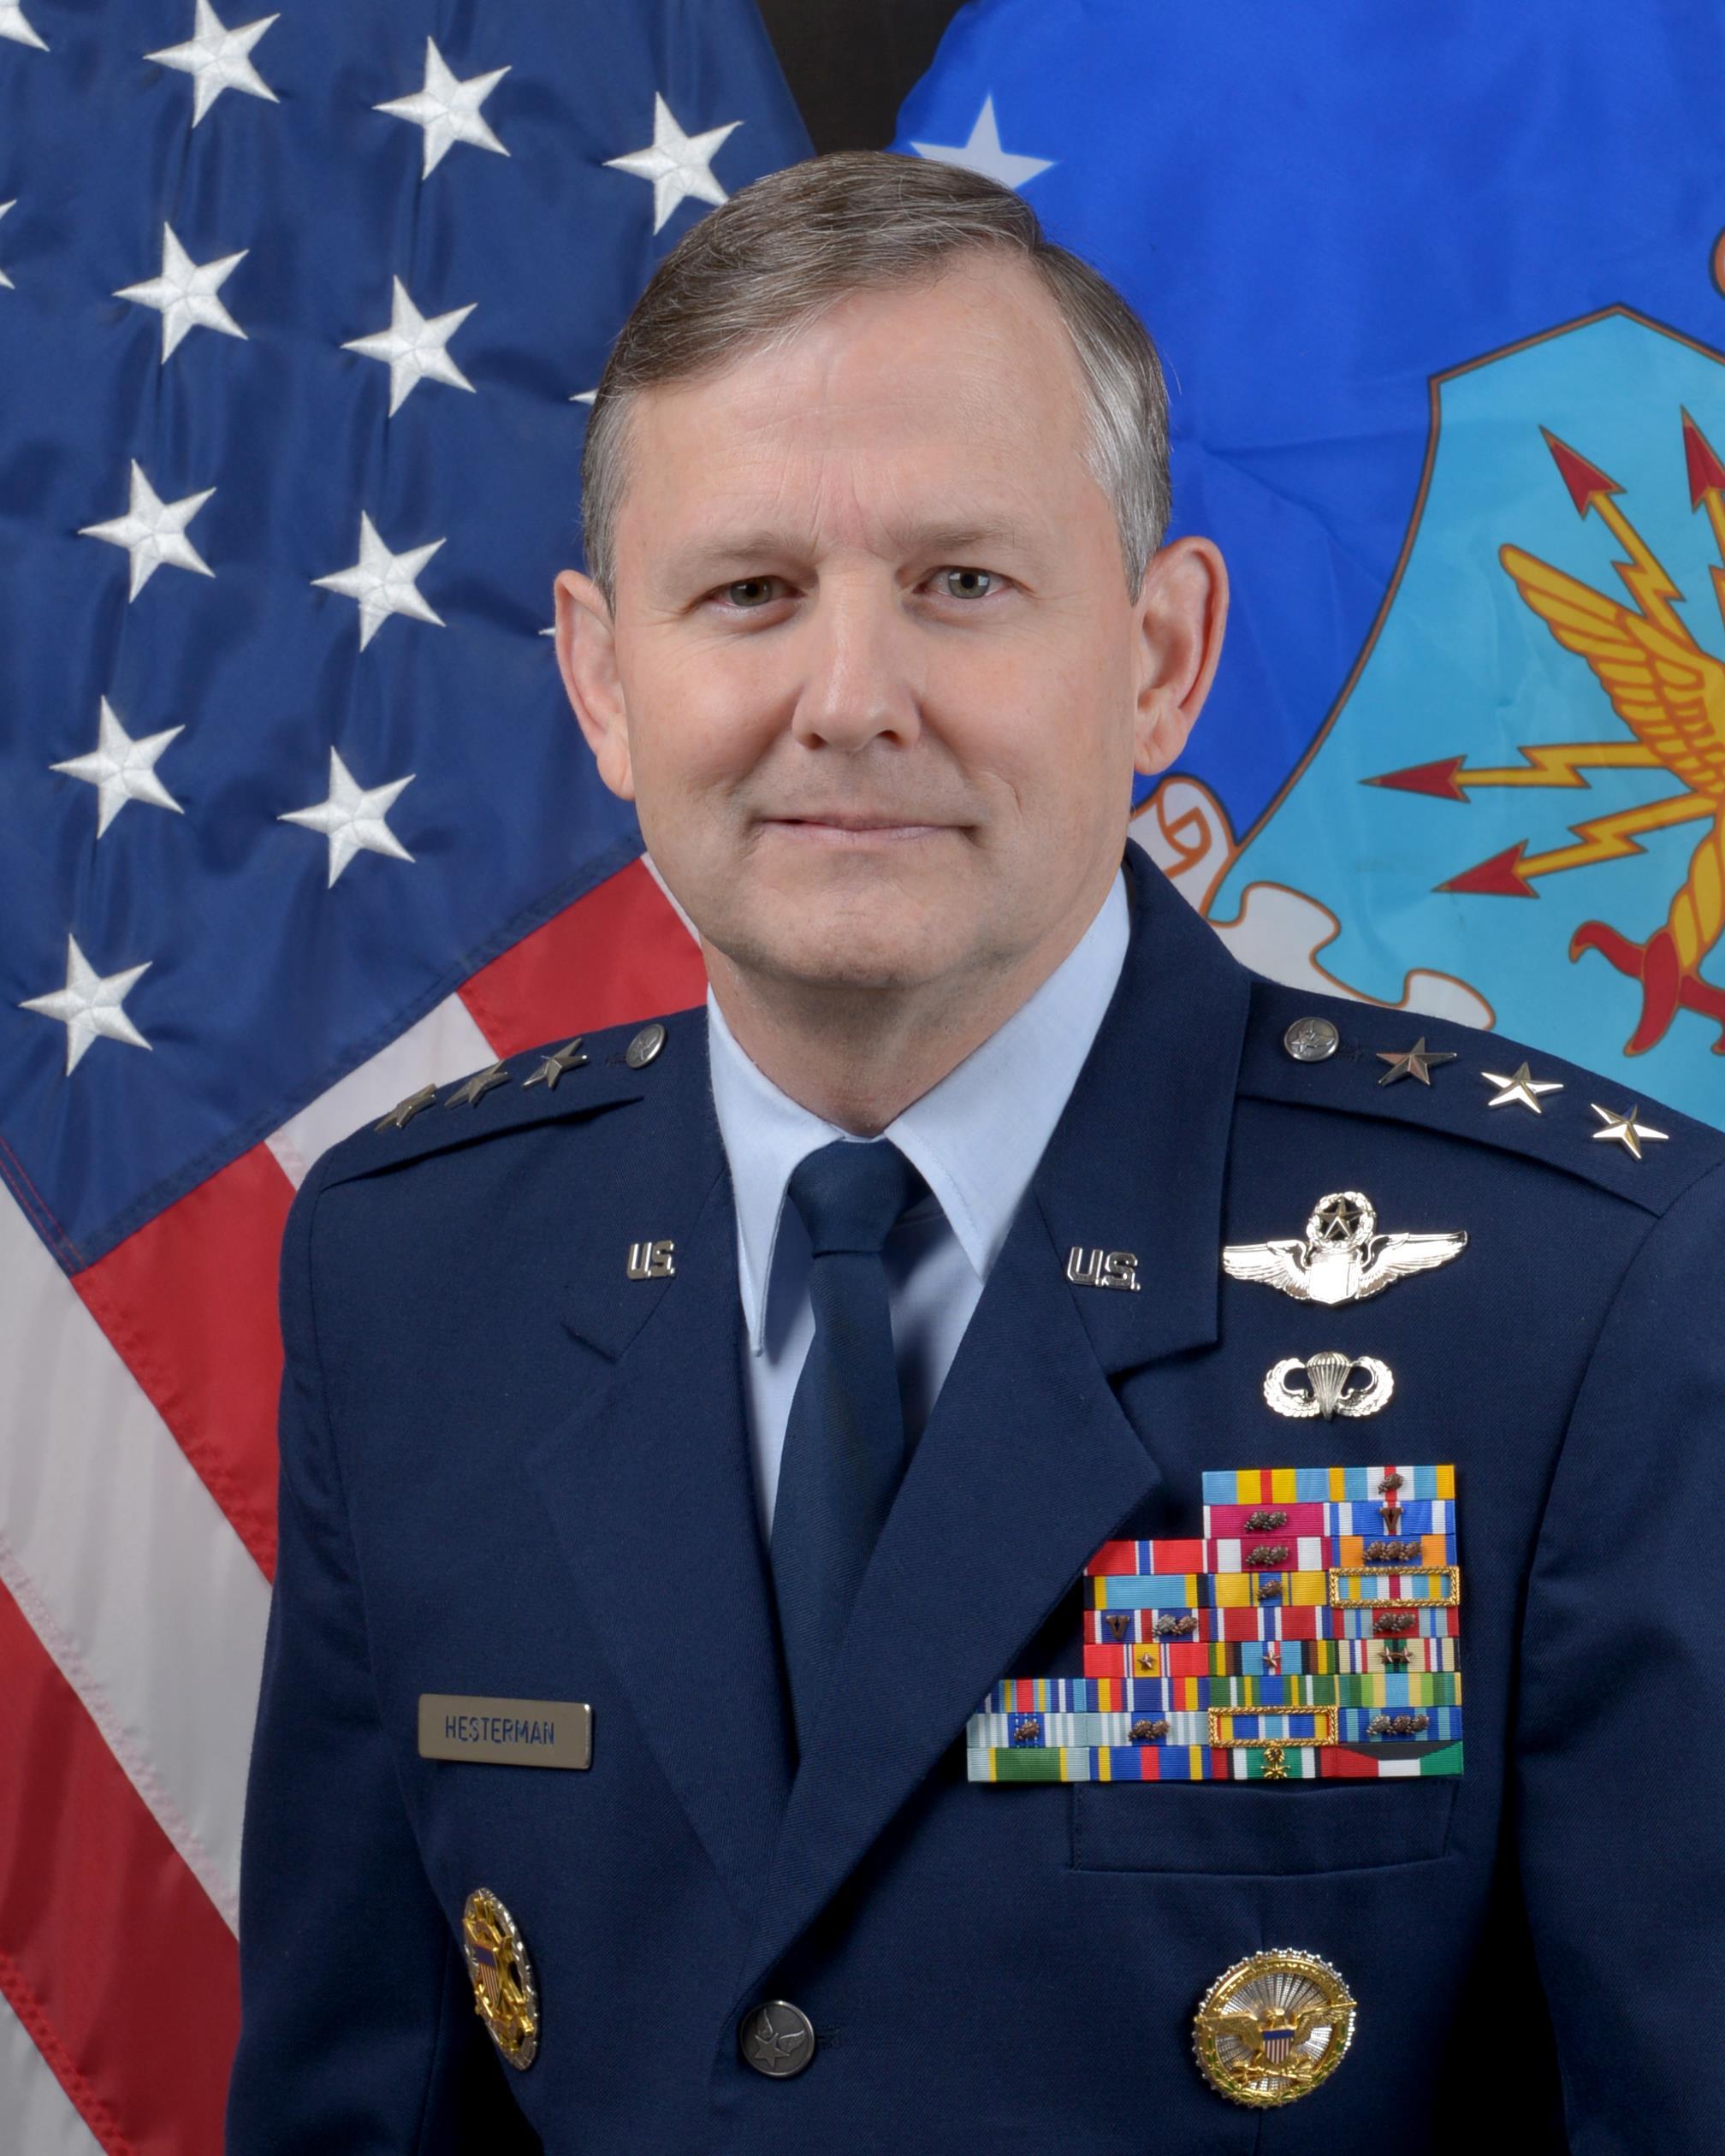 lieutenant general john w hesterman iii u s air force